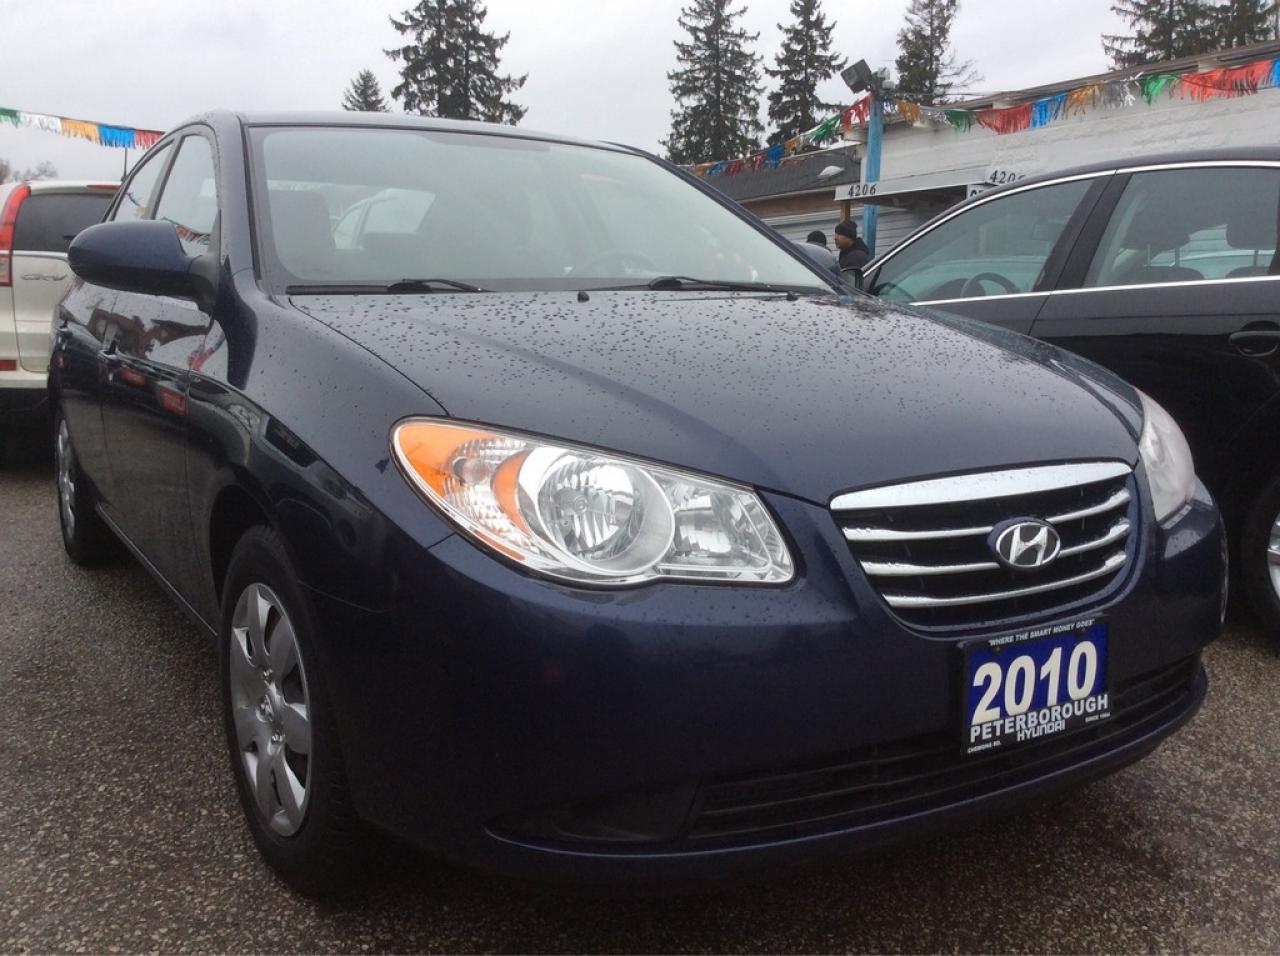 2010 Hyundai Elantra Low KM 120K $Gas Saver$ All Power Options w/AUX